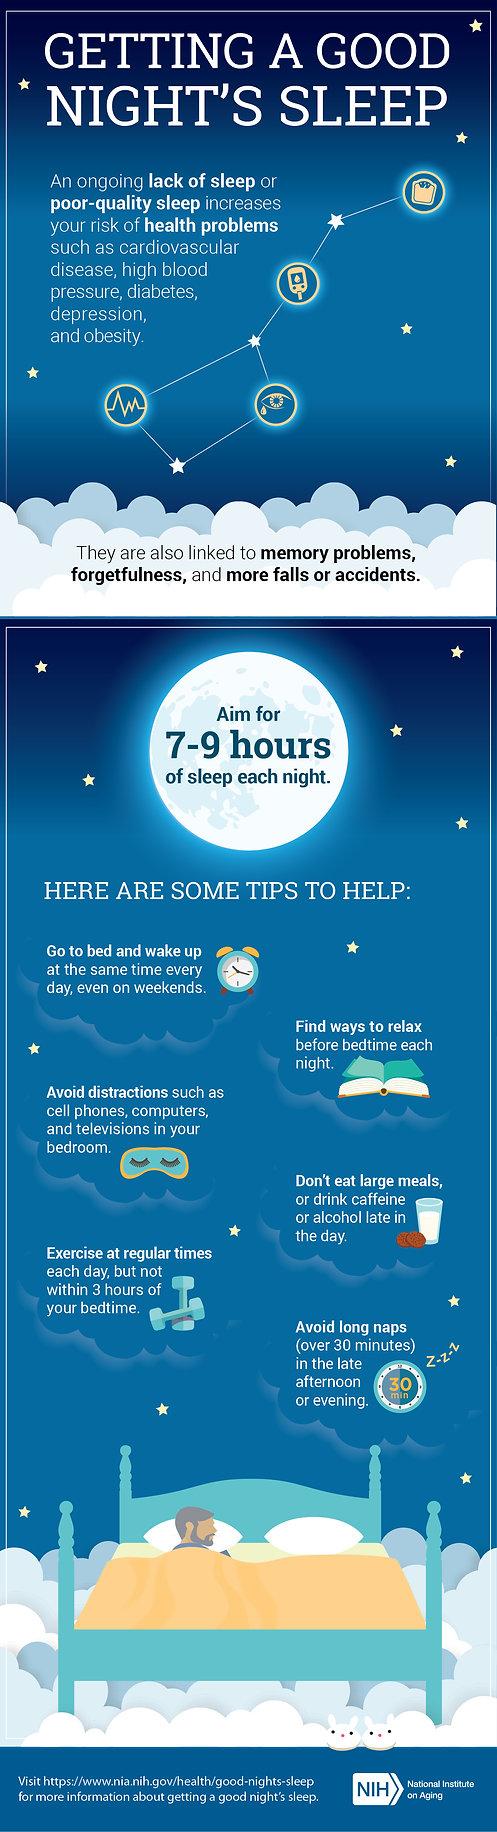 NIA_Sleep_infographic_12.22.17_es-01.jpg